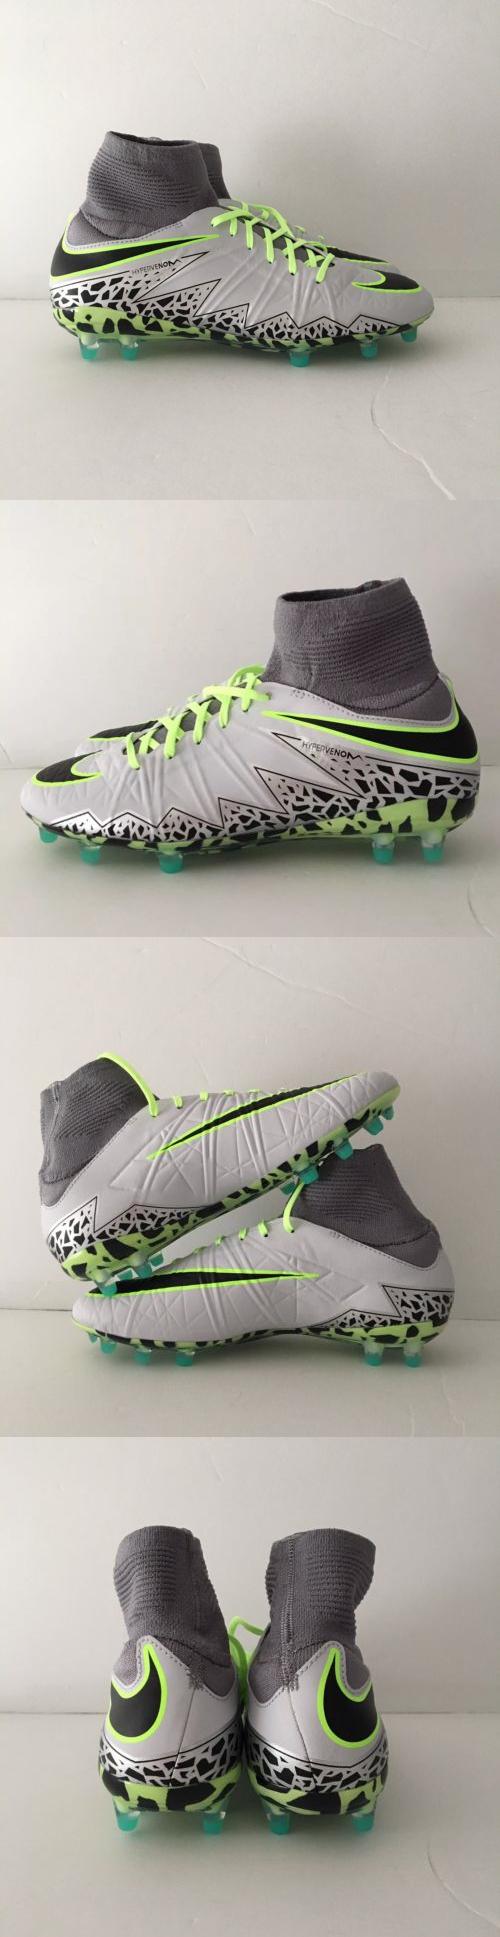 f8a1c201e41b ... authentic youth 159177 nike hypervenom phantom ii fg soccer cleats pure  platinum black ghost green 54301